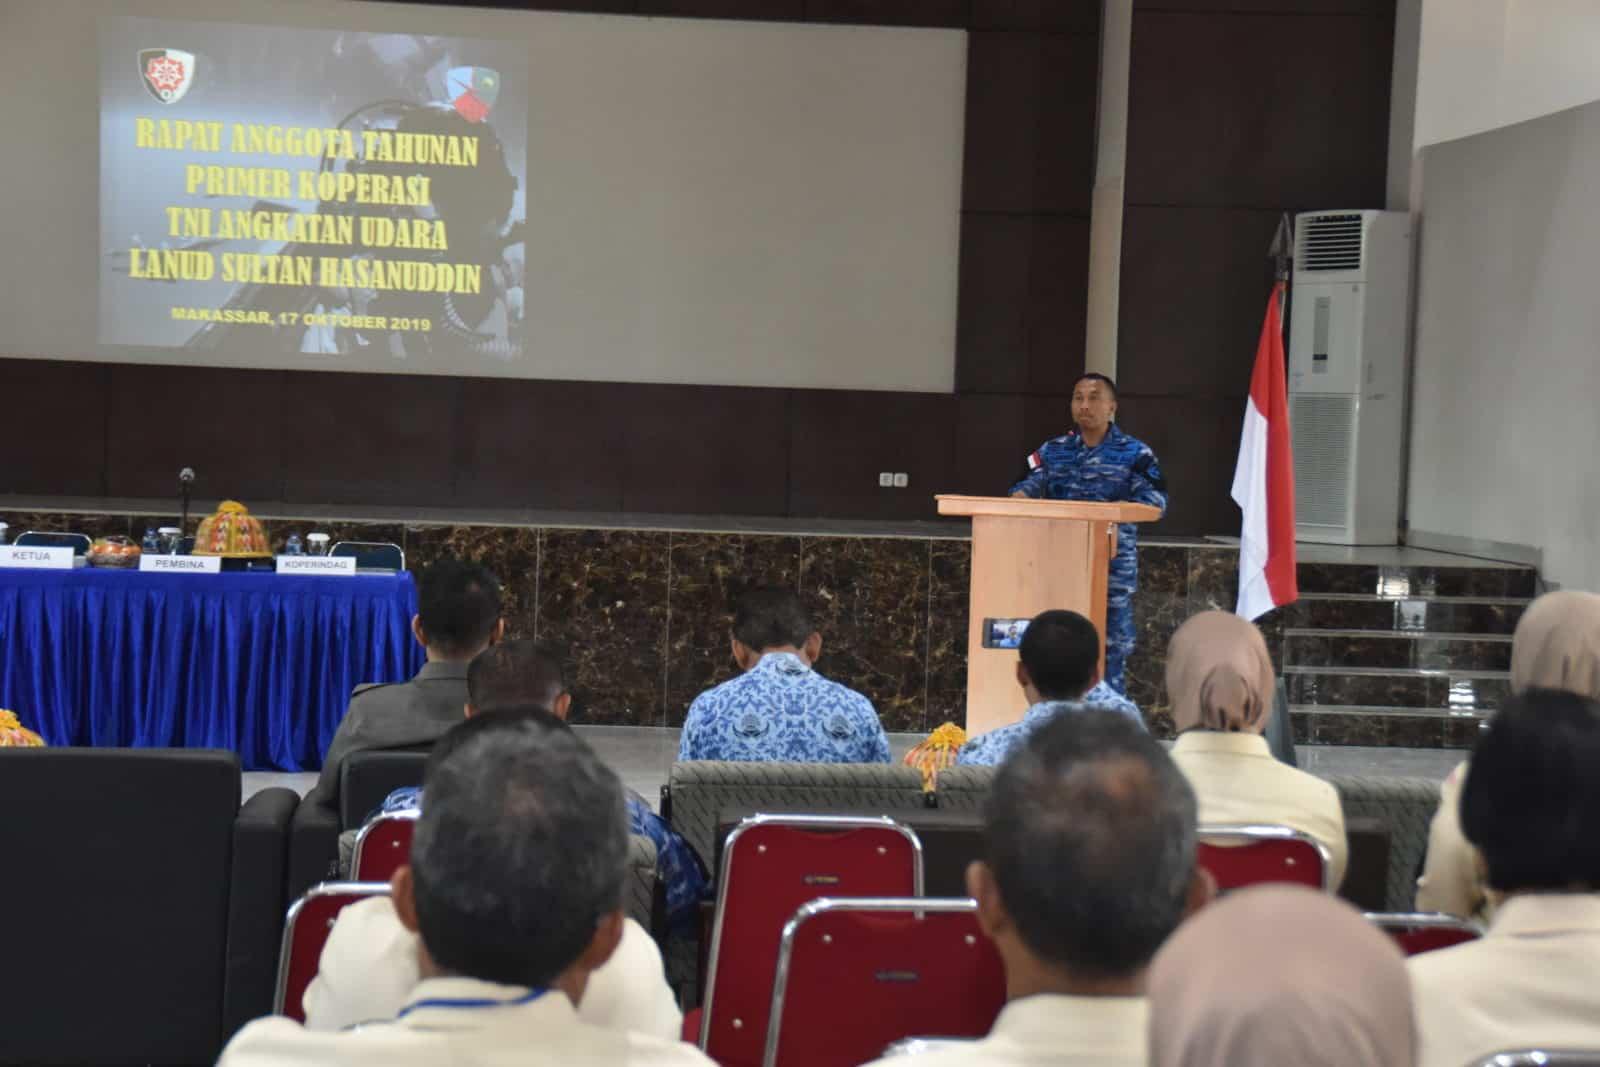 Primkopau Lanud Sultan Hasanuddin Laksanakan RAT XXXIX Tahun Buku 2018